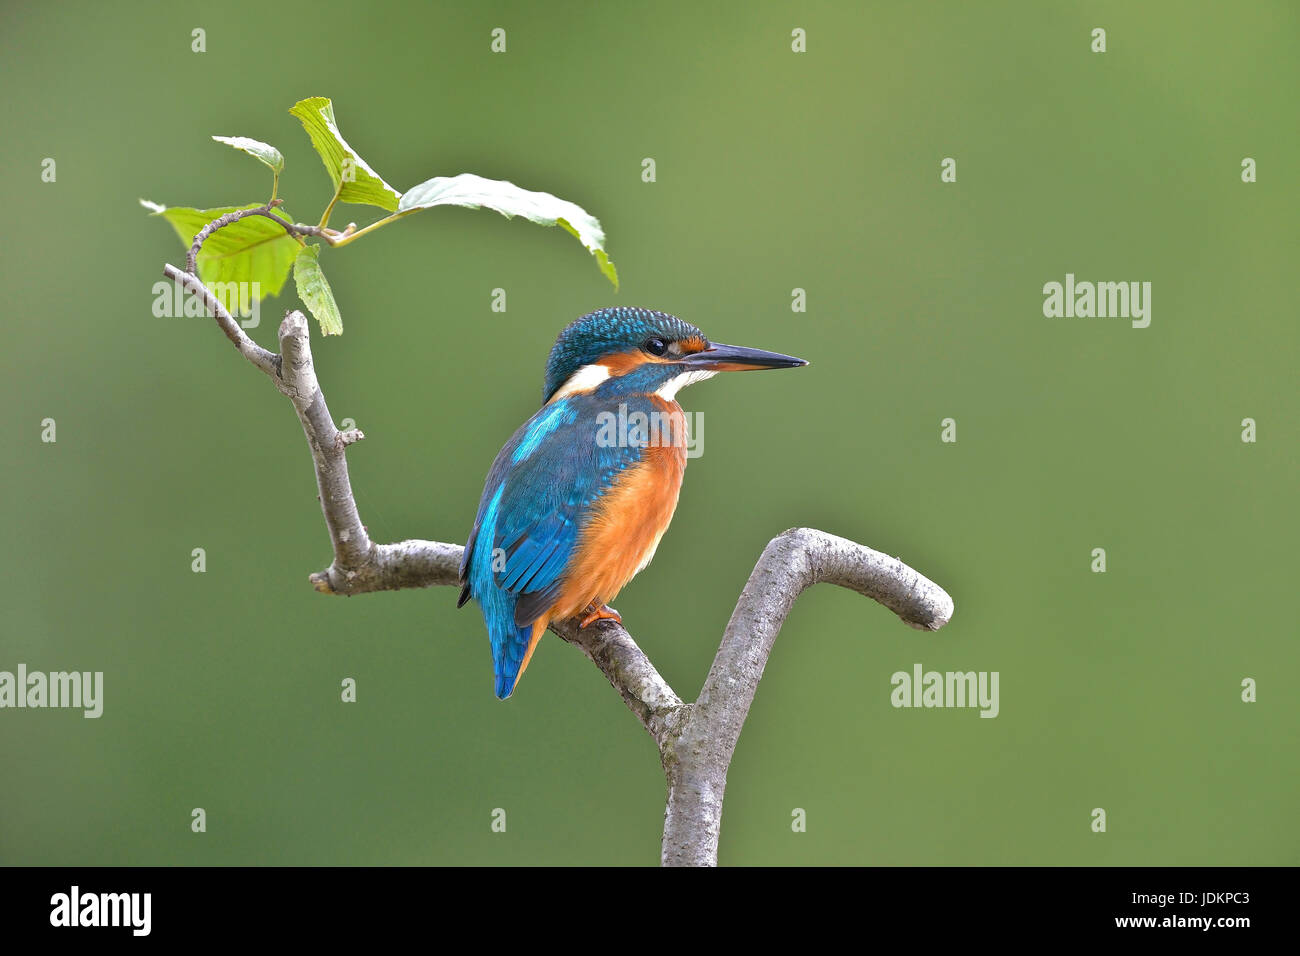 Eisvogel (Alcedo atthis) Common Kingfisher - Stock Image